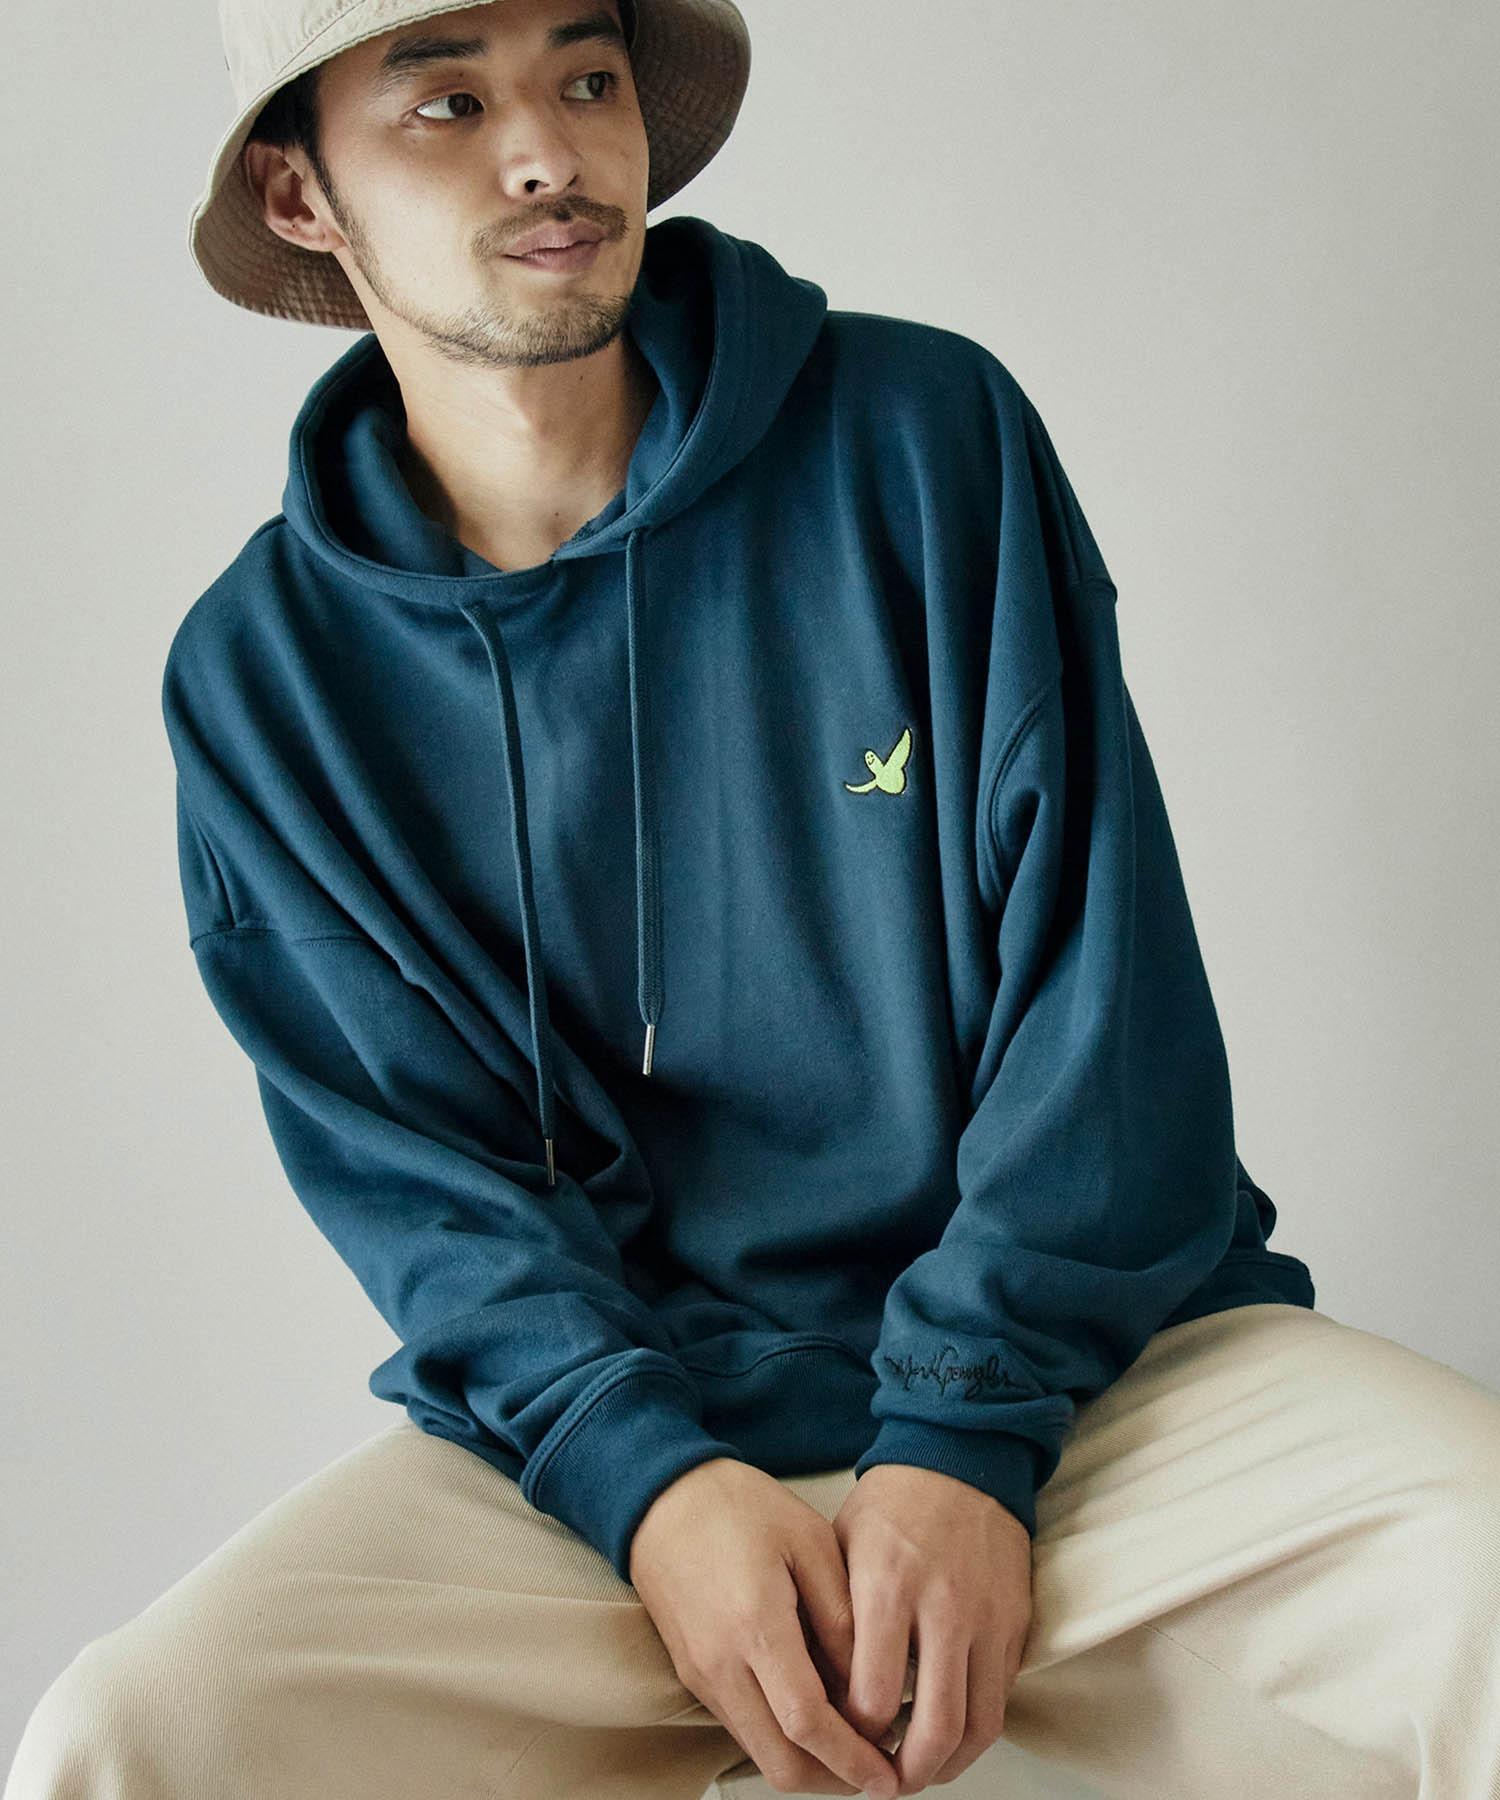 Mark Gonzales/マークゴンザレス MONO-MART別注ロゴ刺繍 オーバーサイズ プルオーバーパーカー